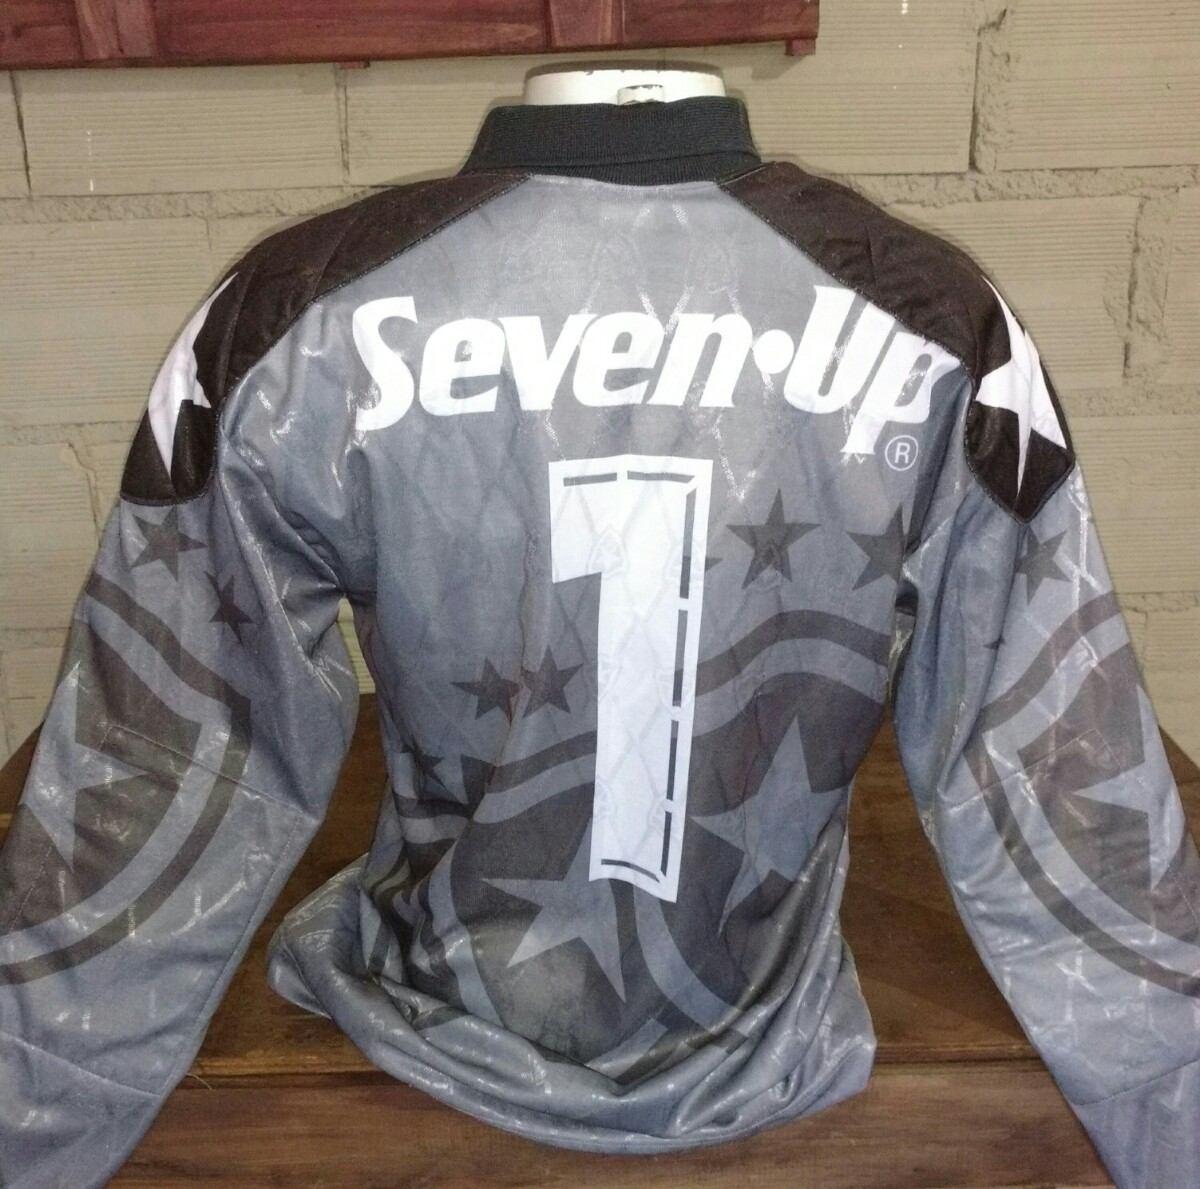 ad505c25d37d8 camisa goleiro wagner botafogo 1996 campeã teresa herrera. Carregando zoom.